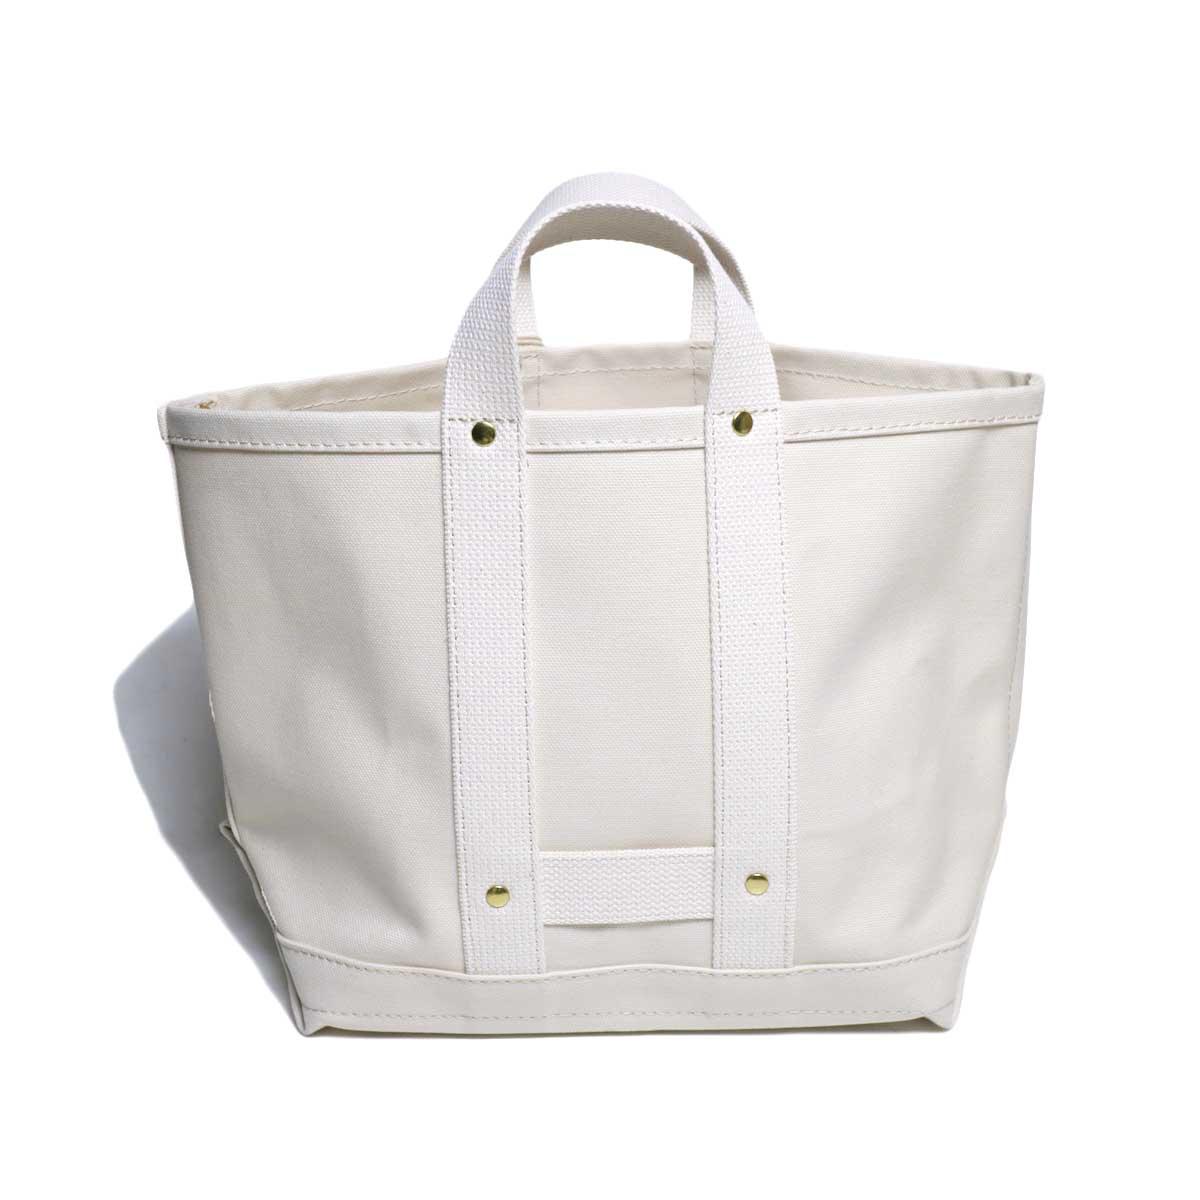 MASTER & Co. / RAILMAN BAG (White S) 正面